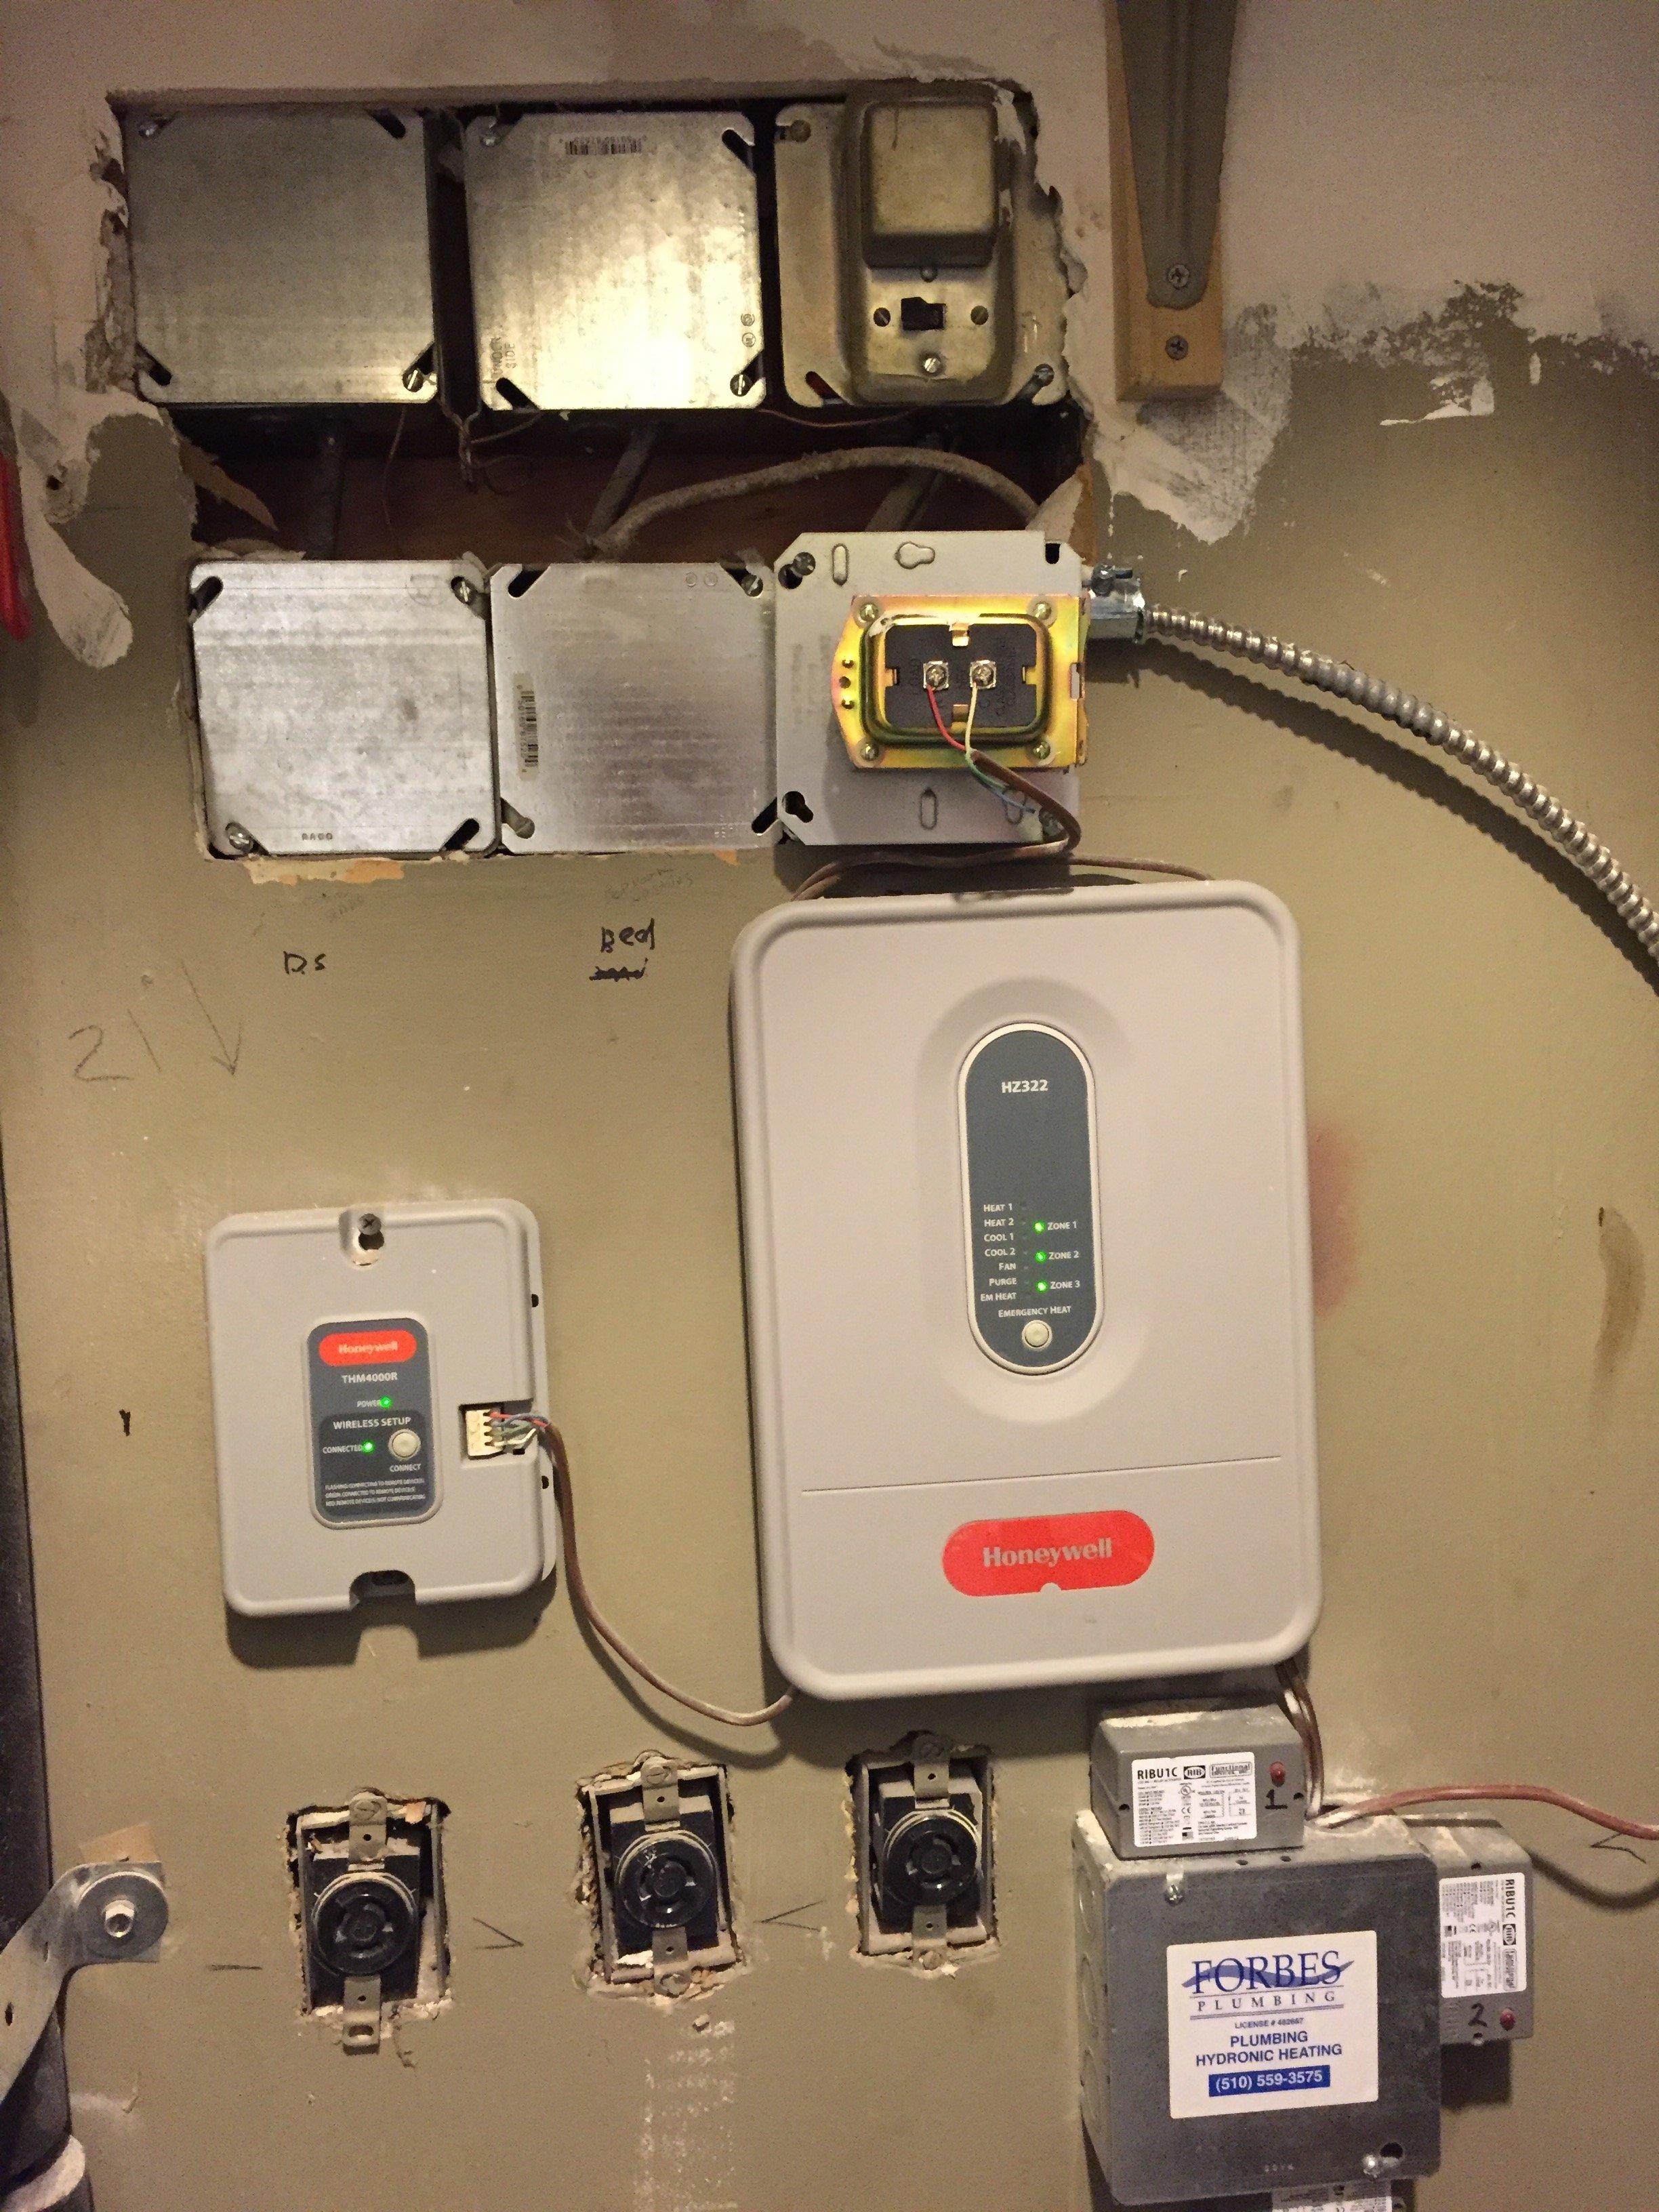 Wireless Honeywell Zone Valve Data Wiring Troubleshooting Tstats Redlink Experience Heating Help The Wall Rh Forum Heatinghelp Com Replacement Head